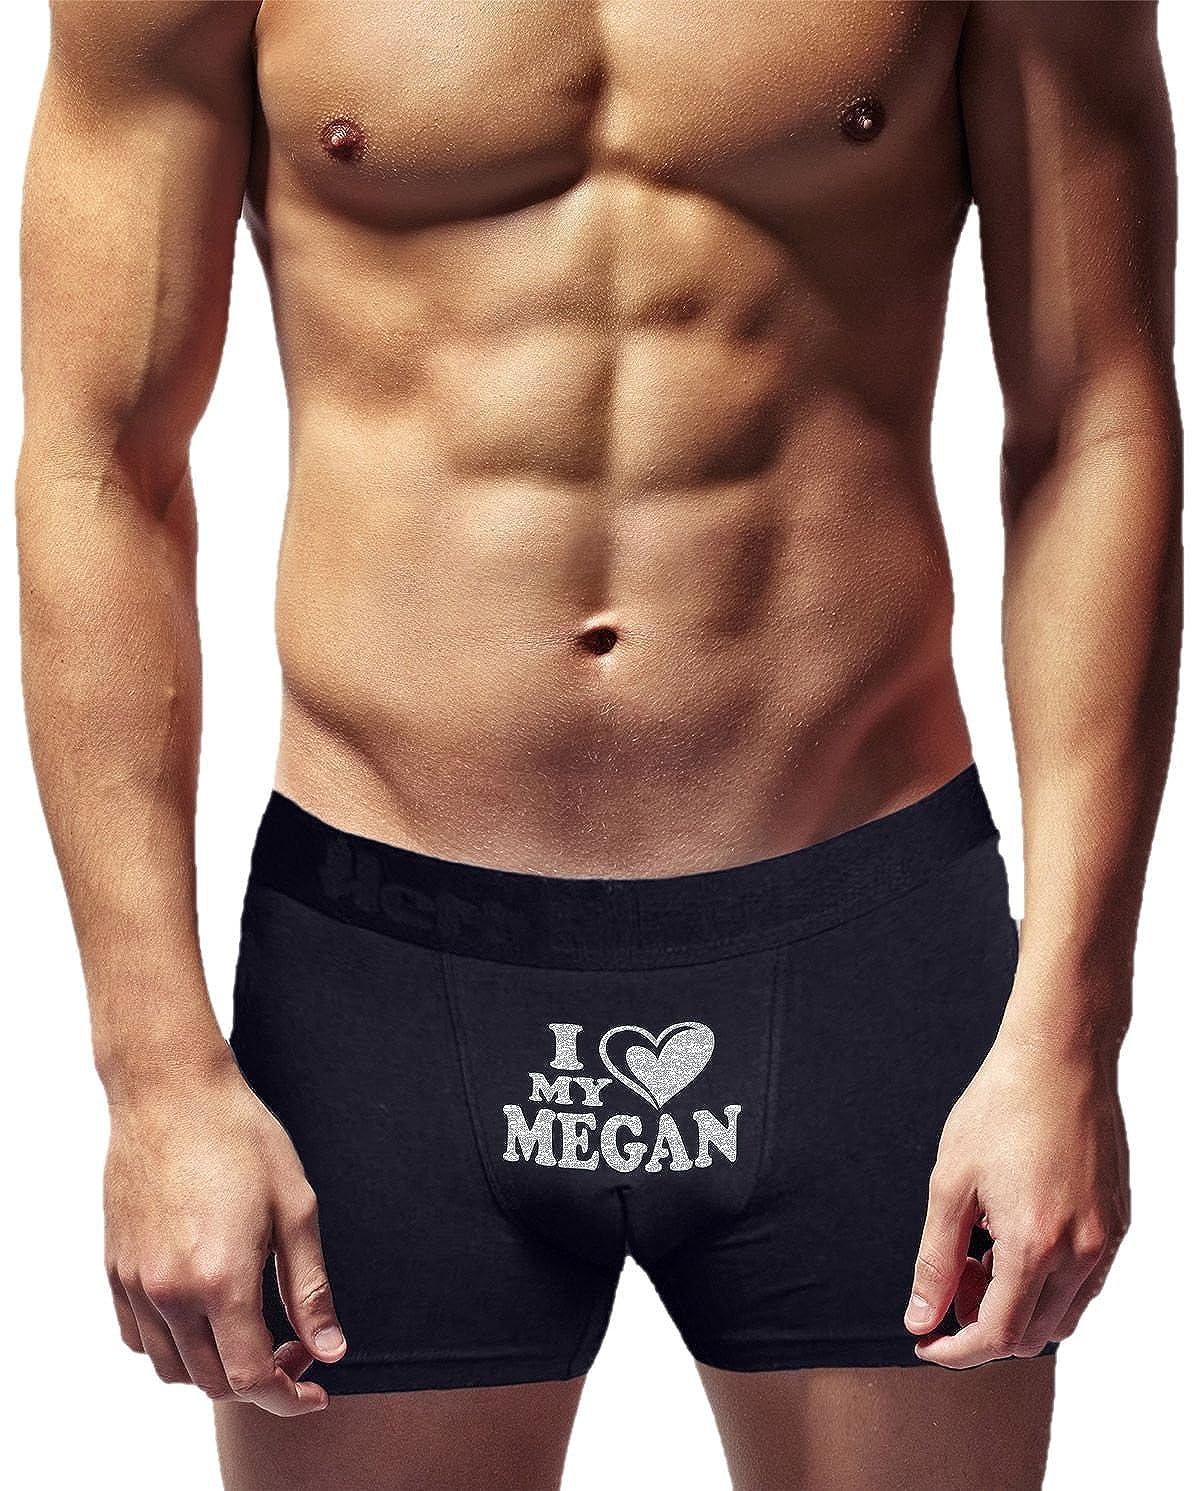 Novelty Item. Birthday Present I Love My Megan Innovative Gift Herr Plavkin Cool Boxer Briefs